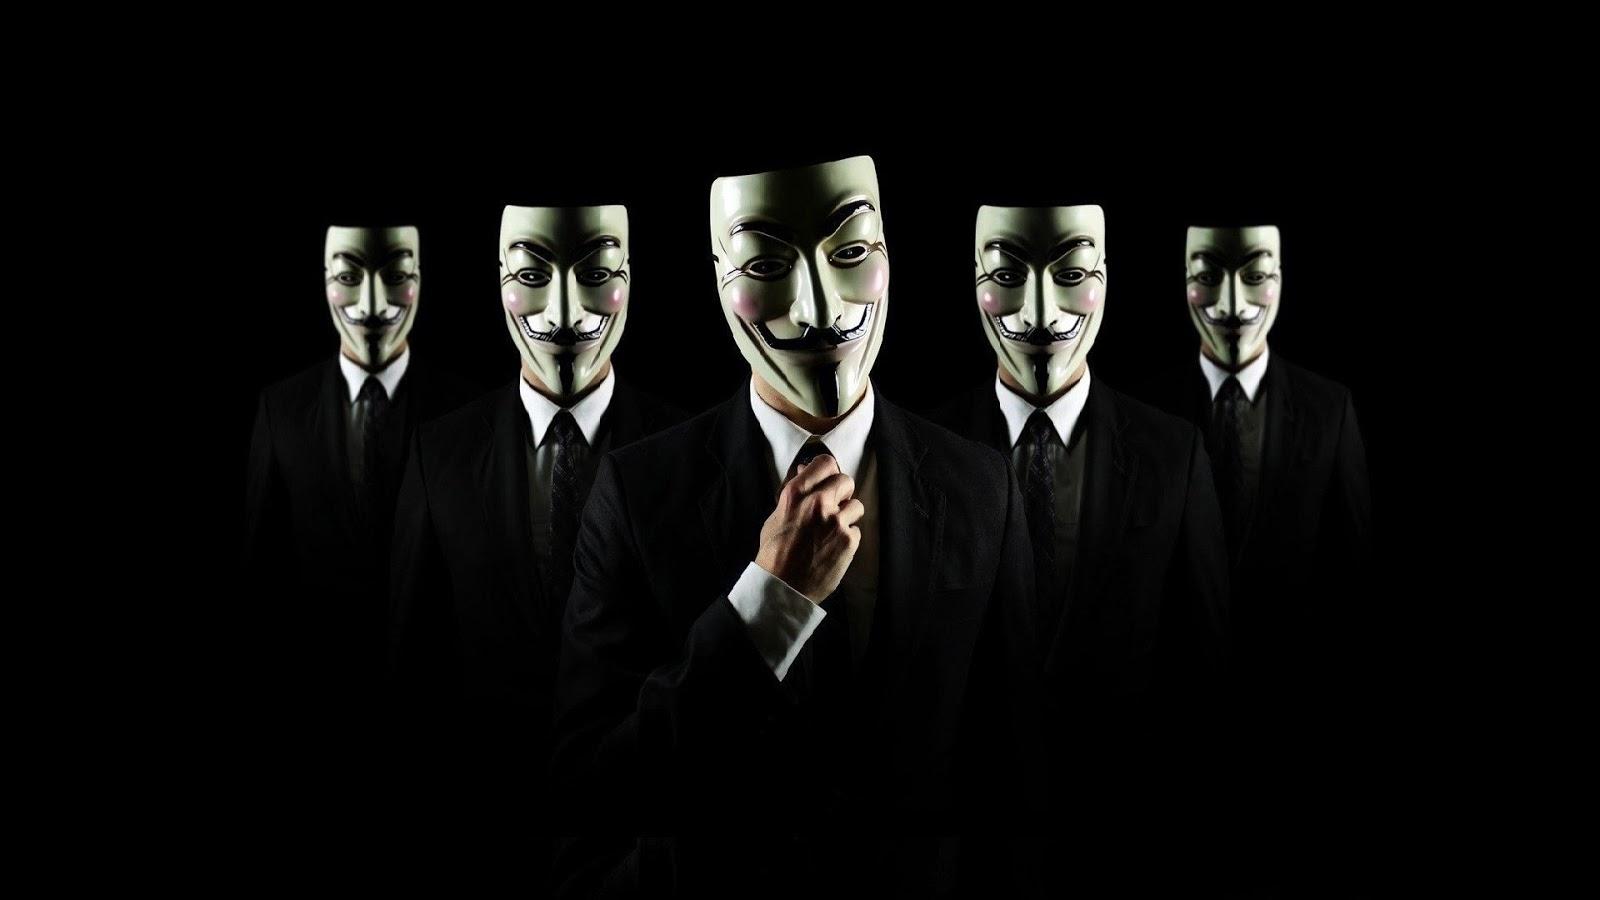 Ảnh Anonymous chất